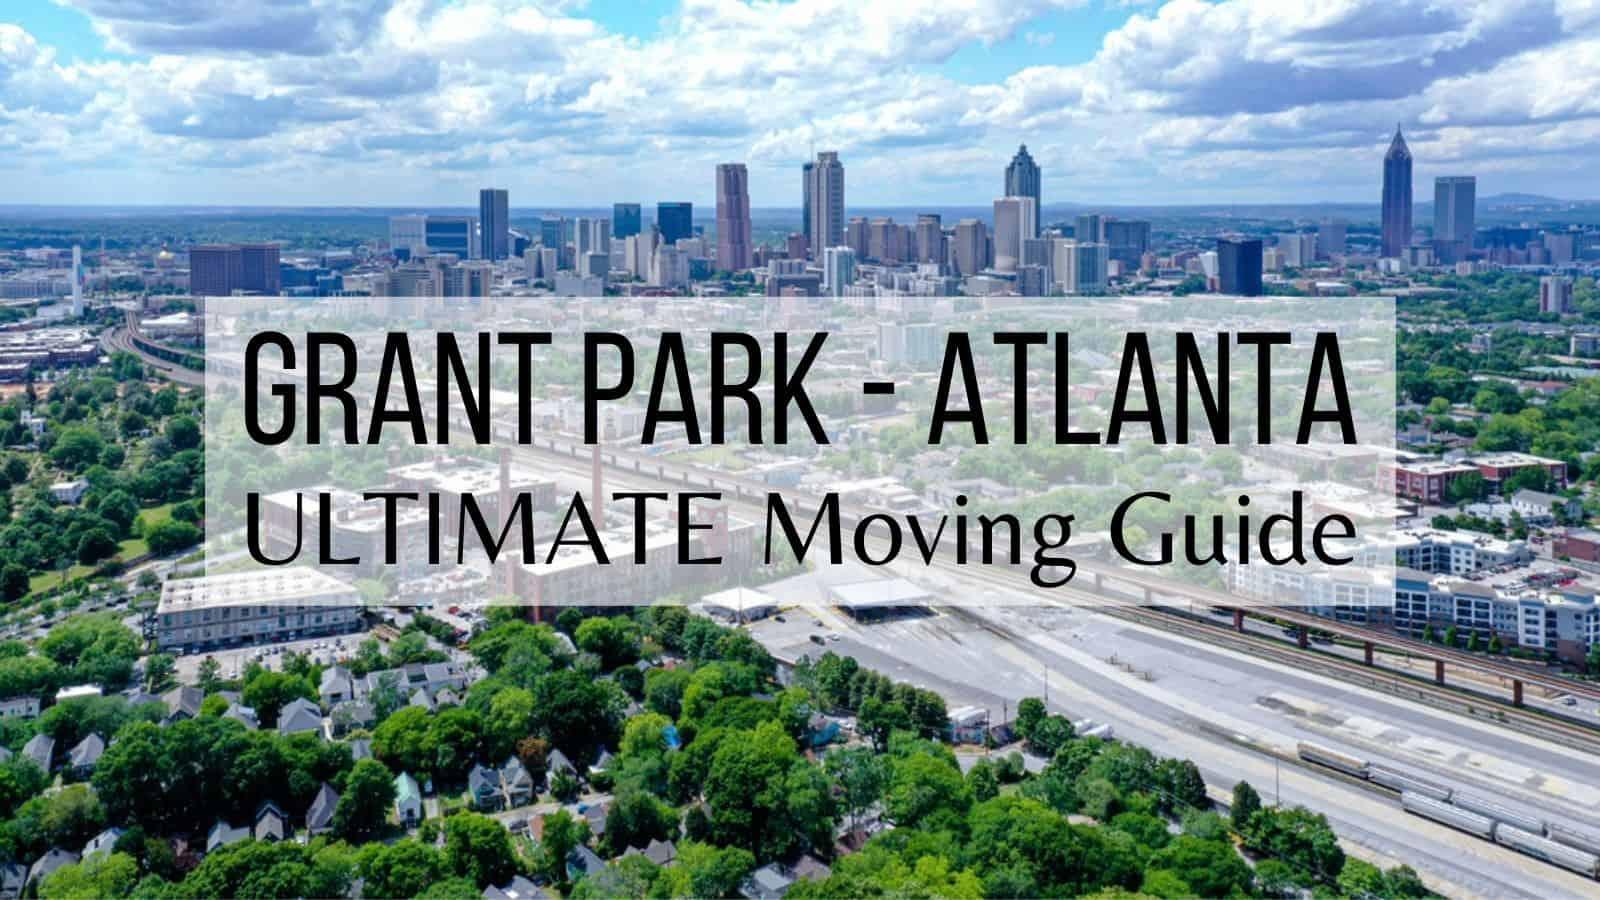 Grant Park - Atlanta - Ultimate Moving Guide